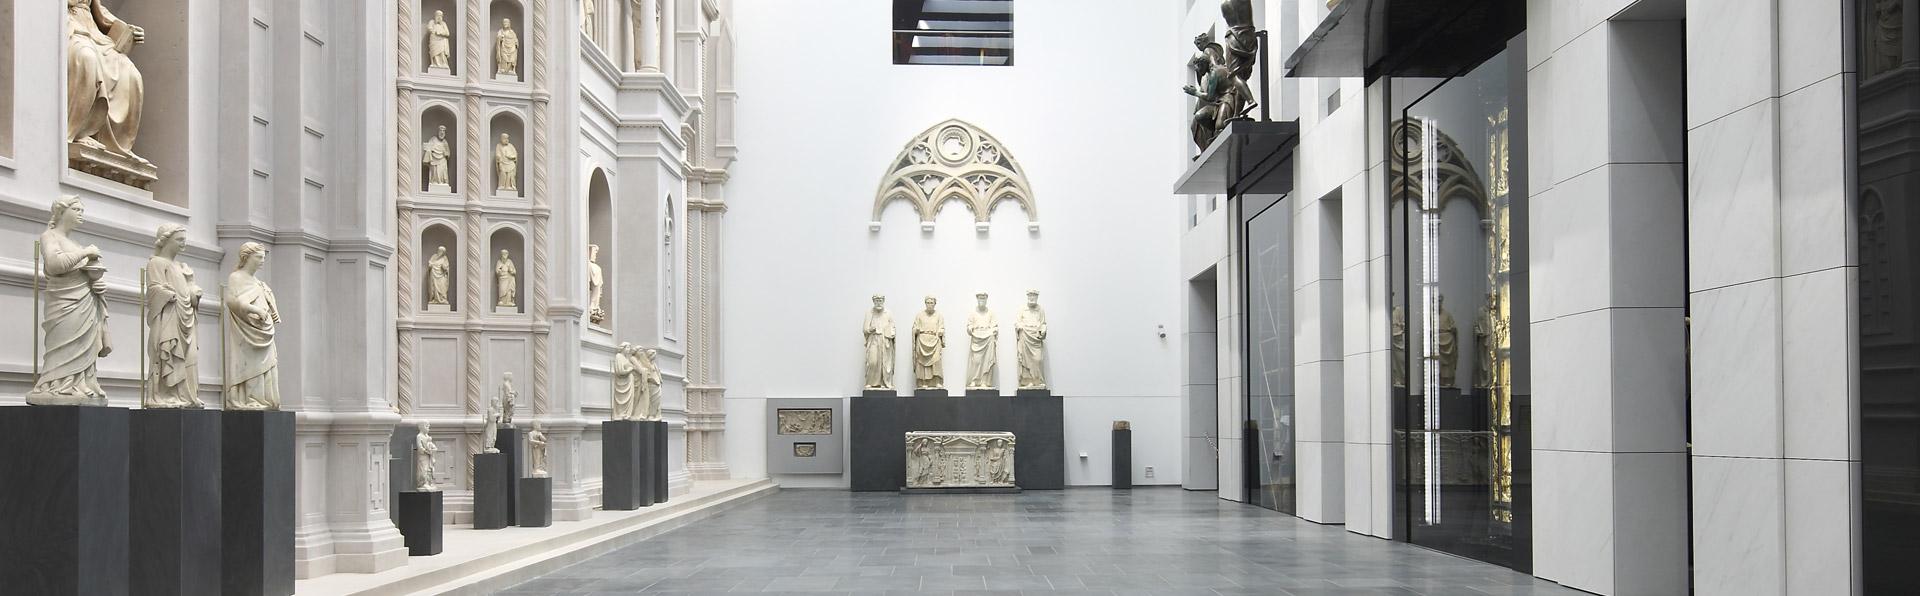 cmb-restauri-renovation-museo-opera-duomo-museum